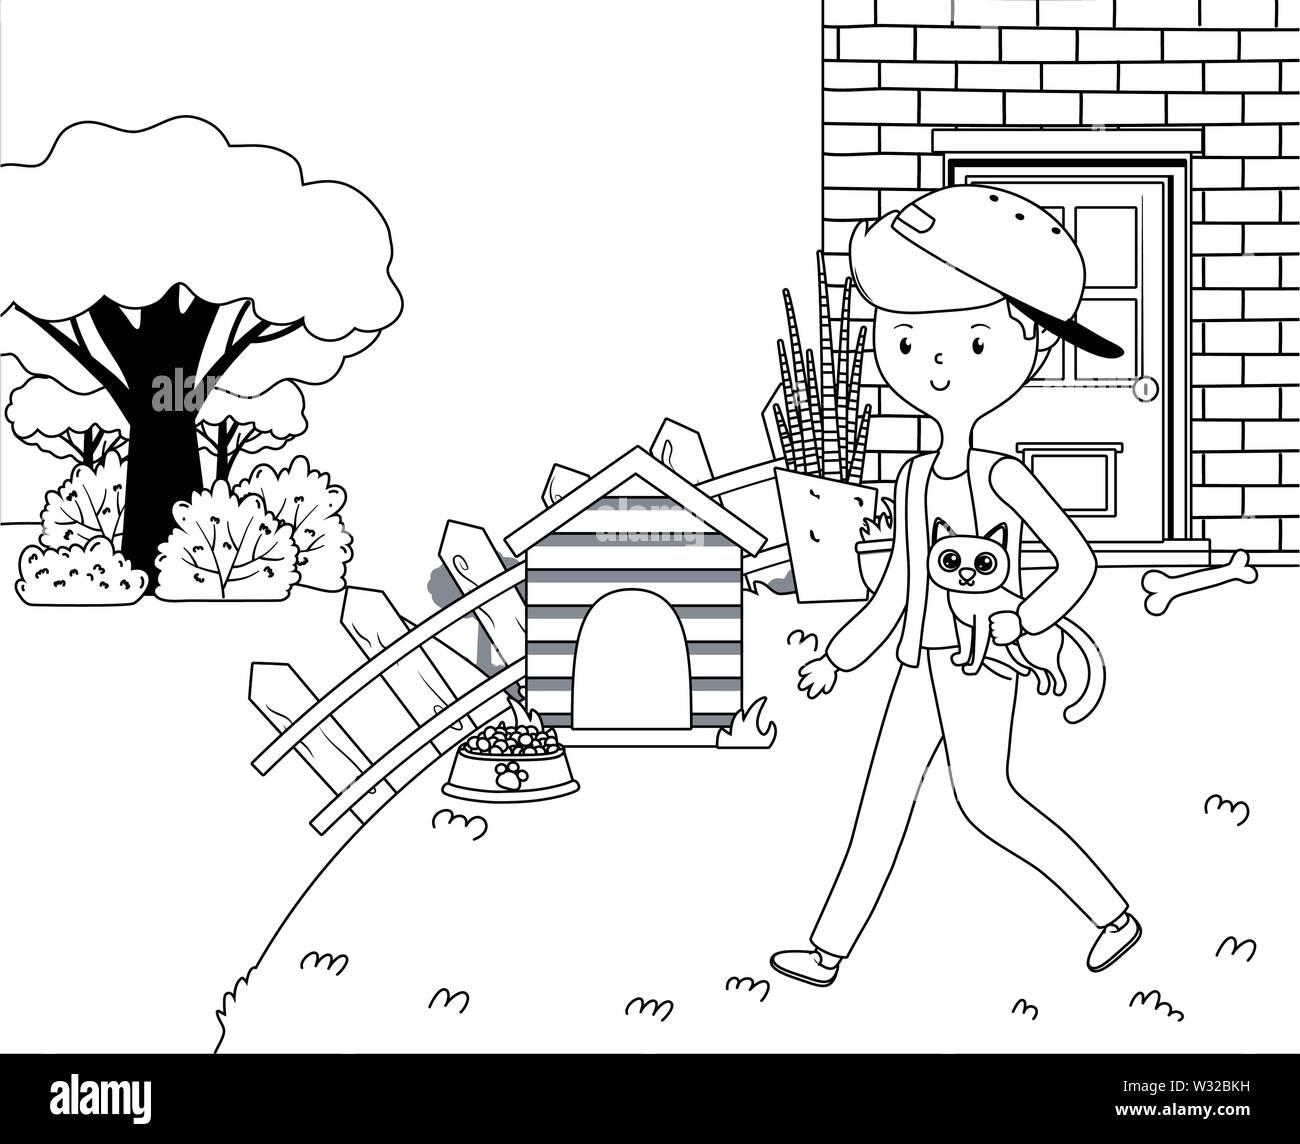 Boy with cat cartoon design, Mascot pet animal domestic cute life nature and fauna theme Vector illustration - Stock Image